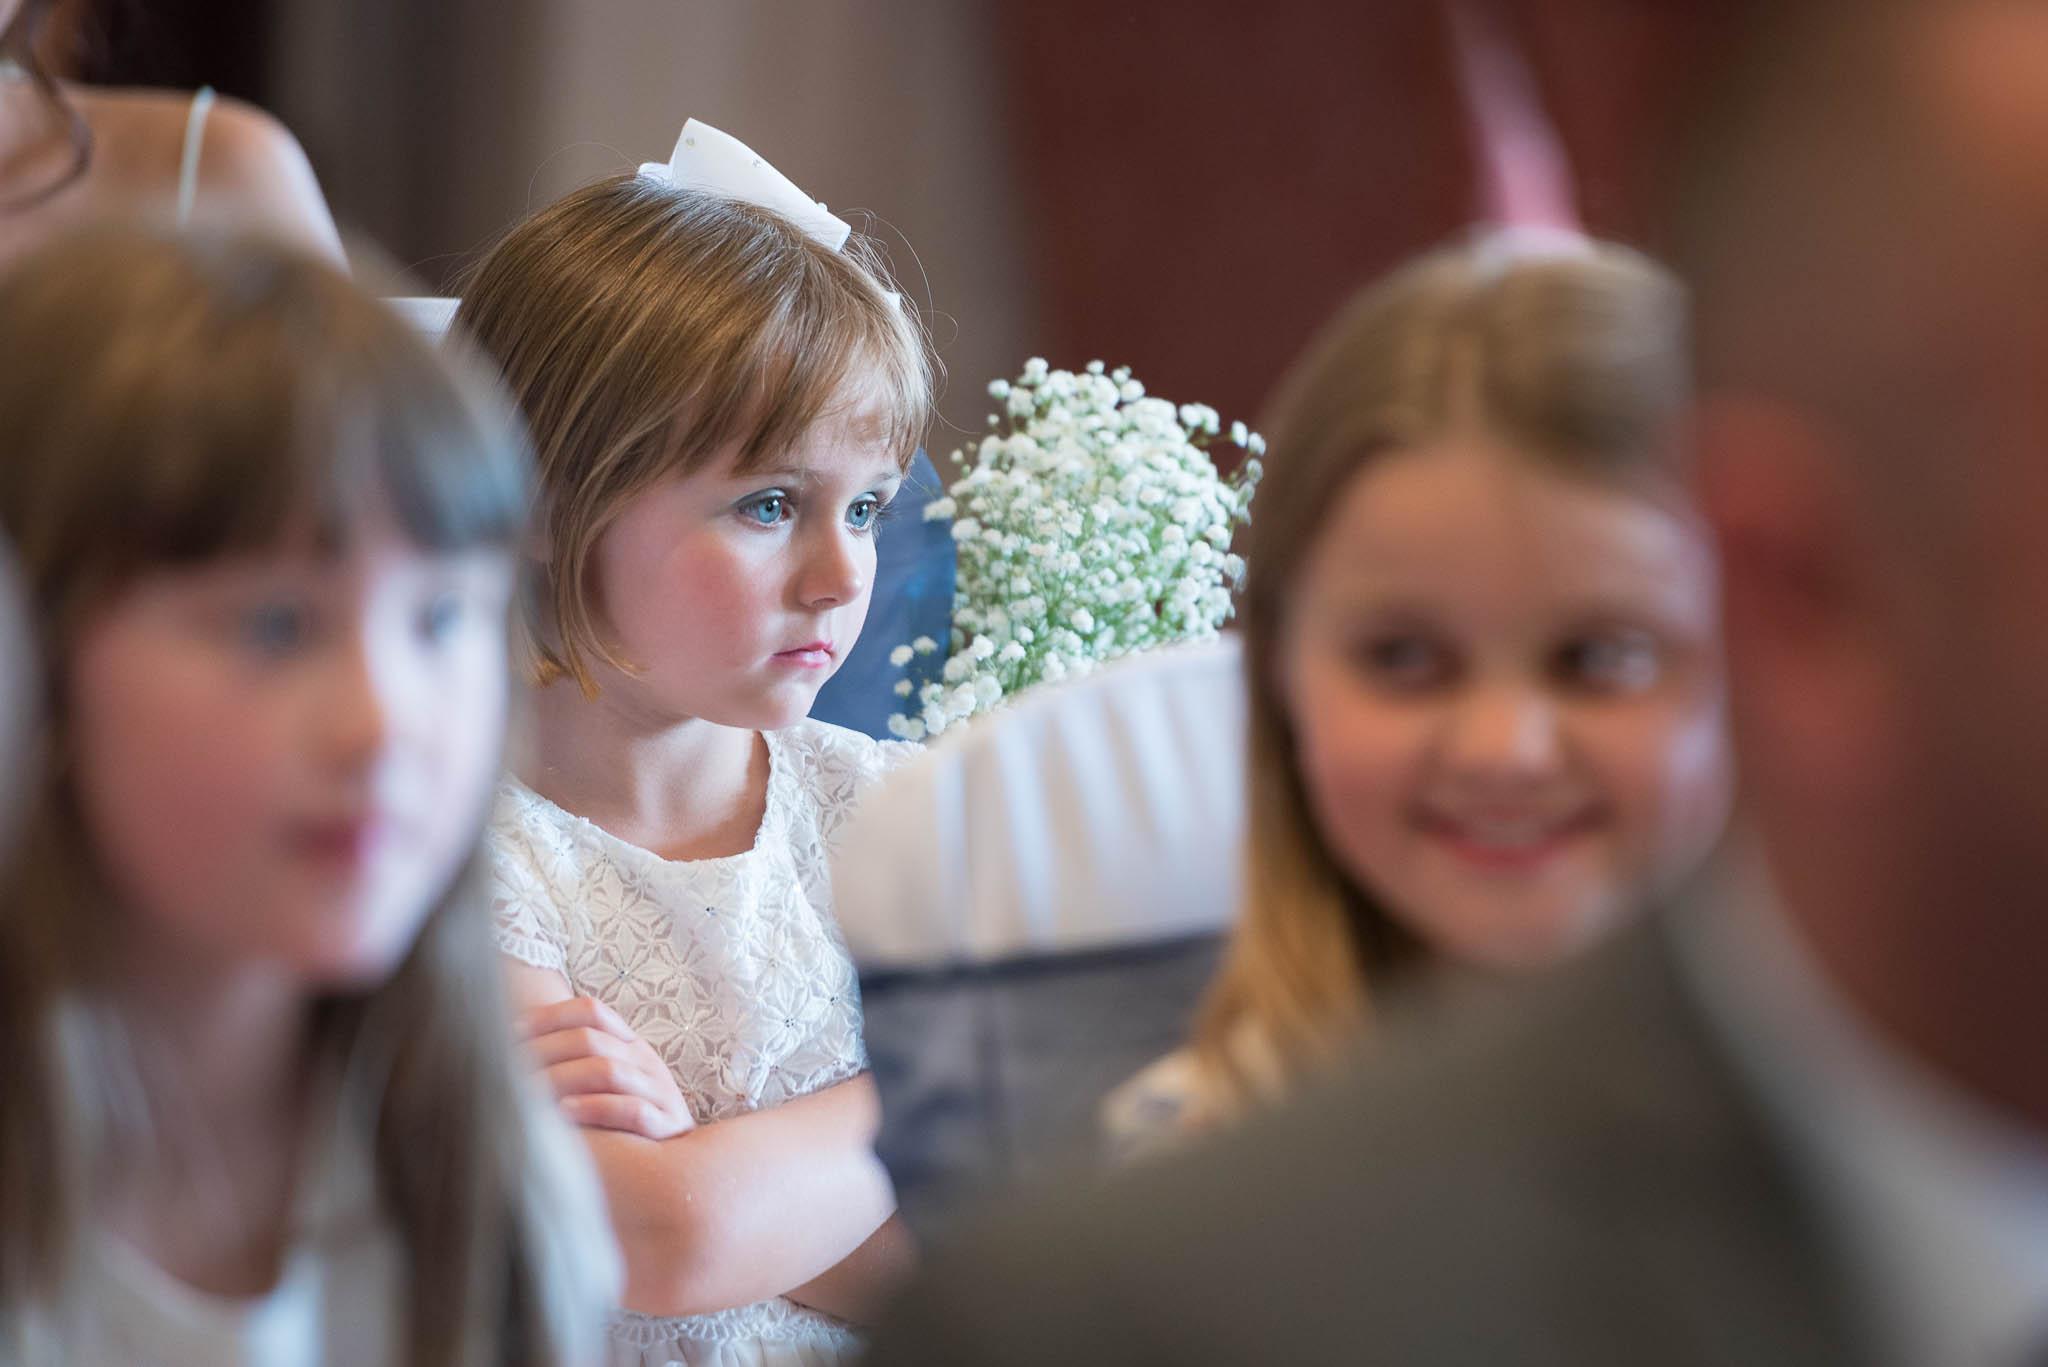 Crathorne Hall Hotel Wedding Photographer59.jpg